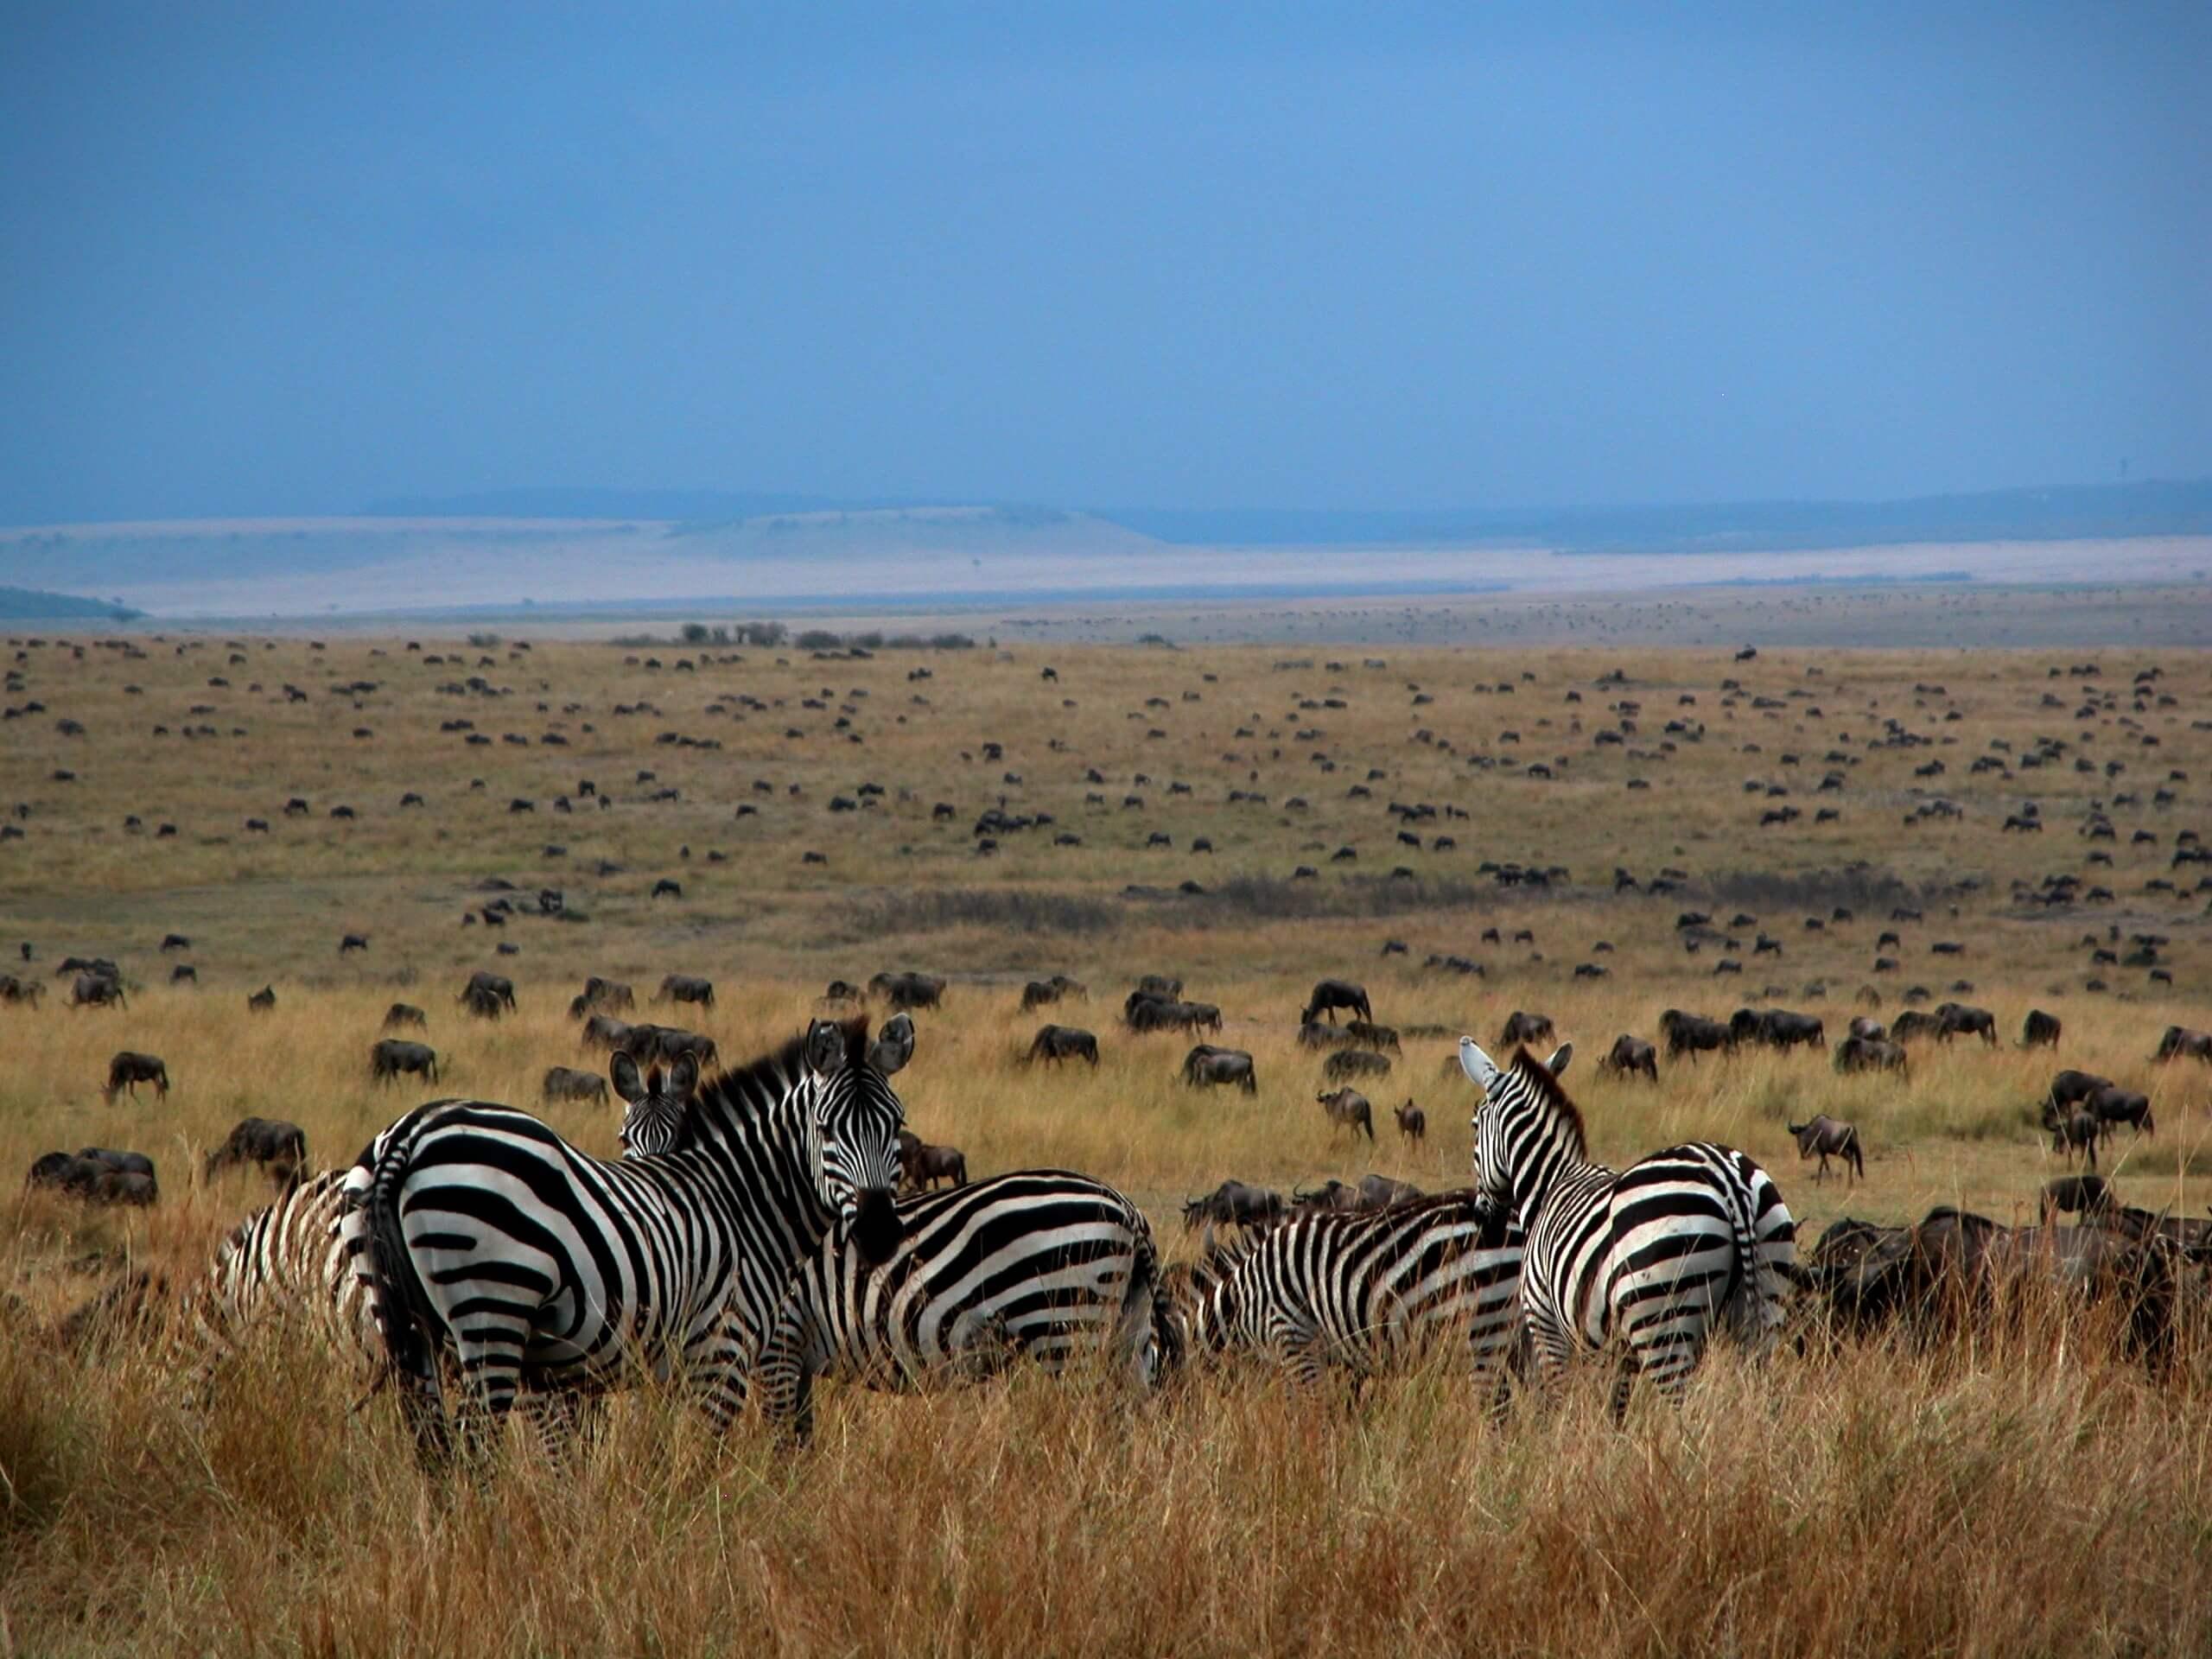 Safari Tanzania zebra's kijken uit op Grote Migratie Serengeti Tanzania